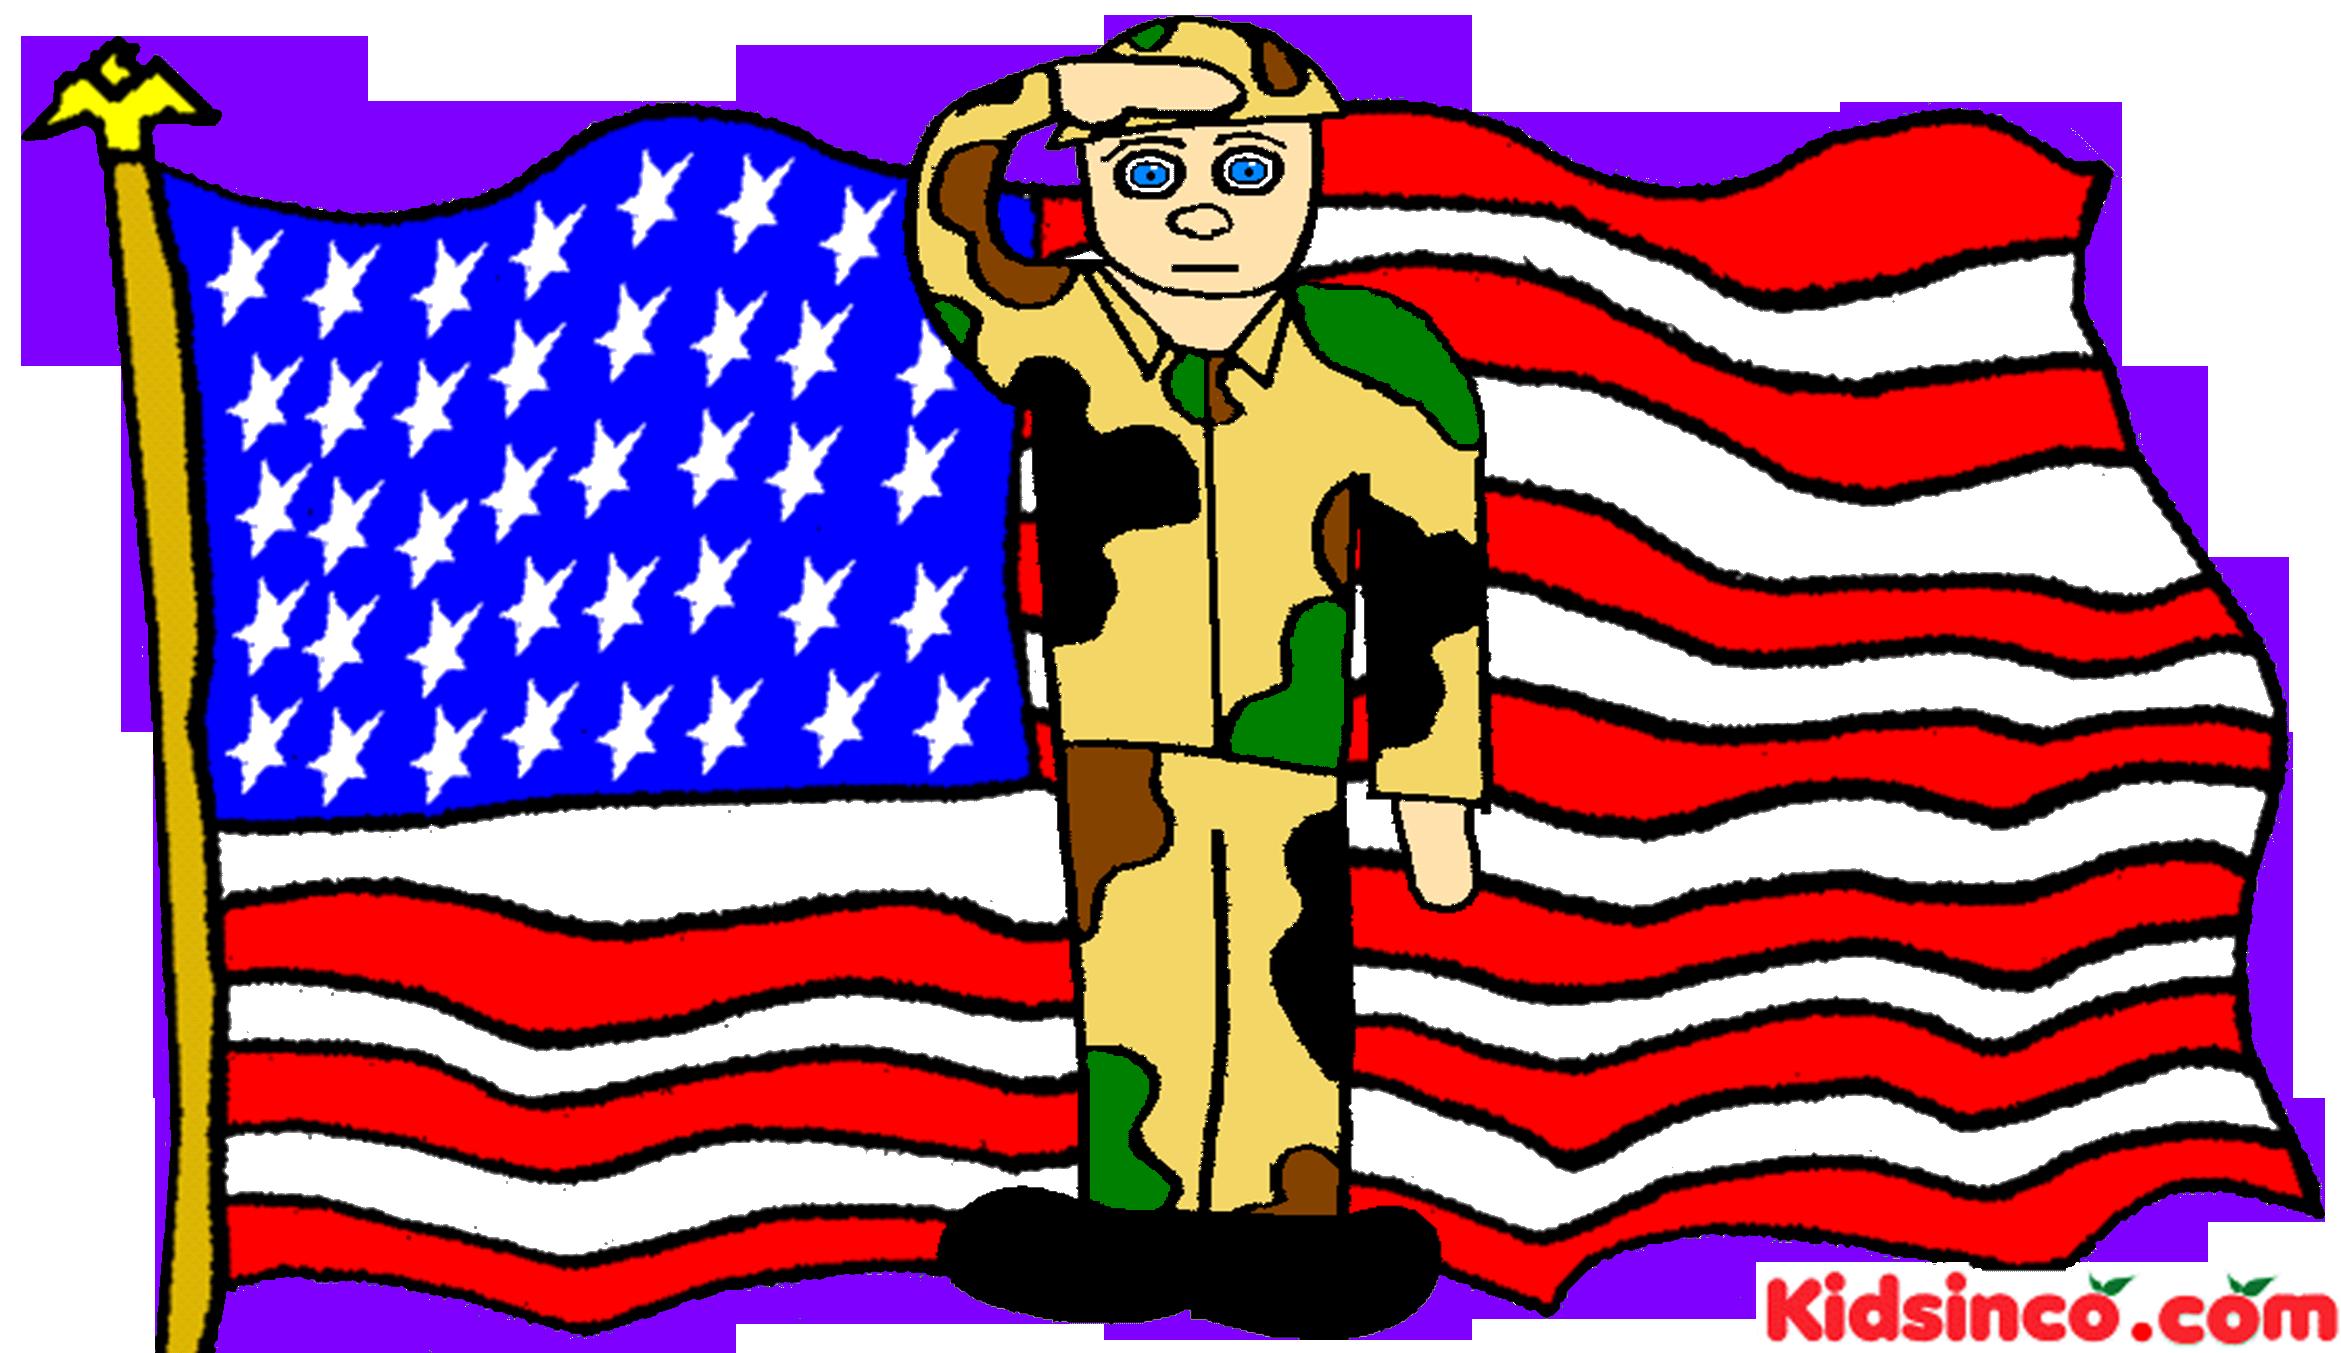 Veterans Day Clipart Veterans Day Clip A-Veterans Day Clipart Veterans Day Clip Art 14 Png-17